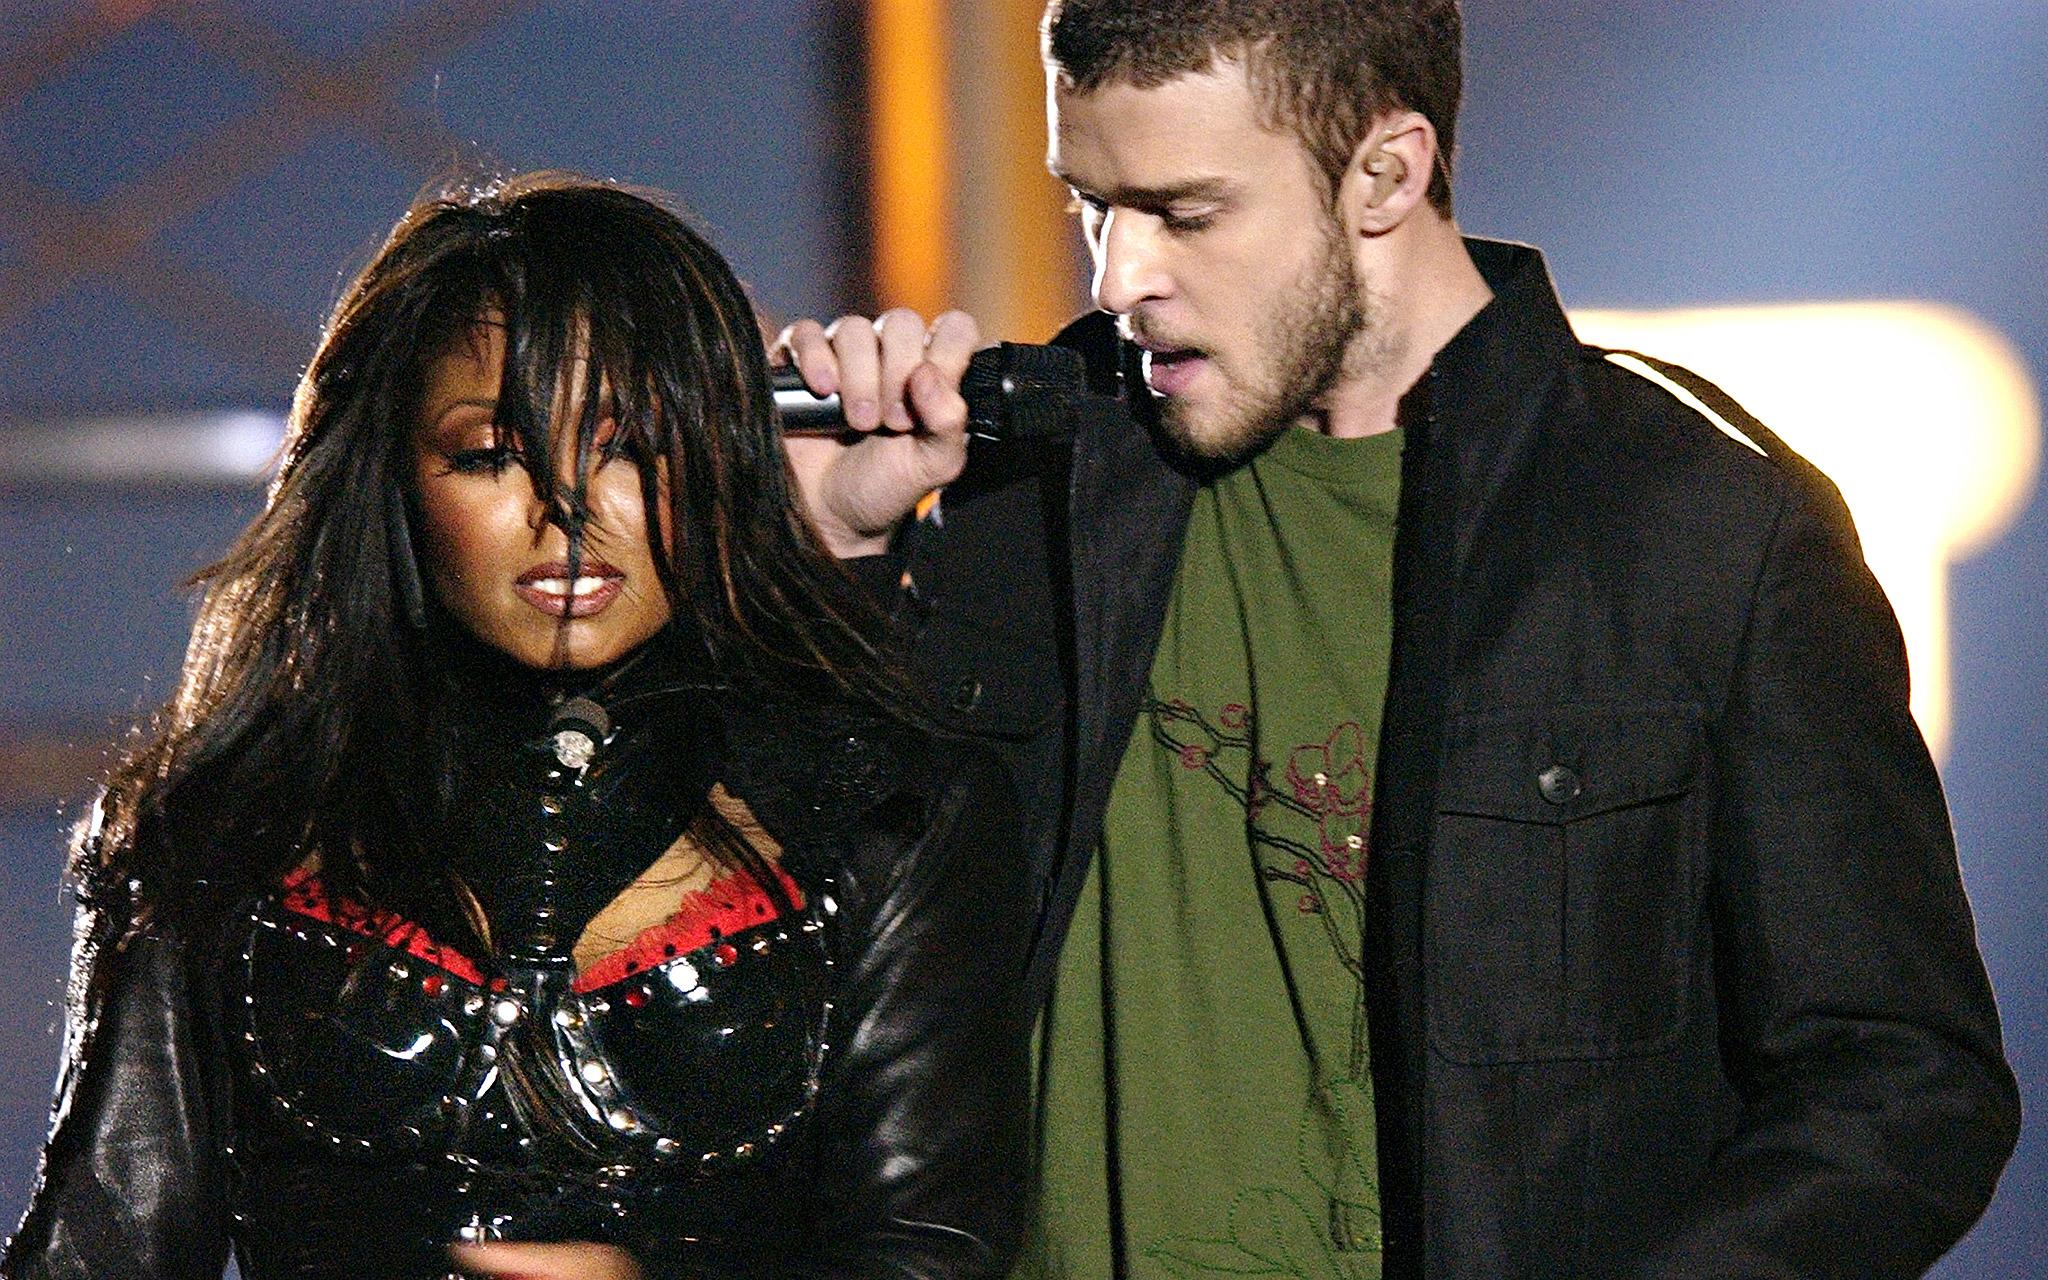 Super Bowl XXXVIII: Justin Timberlake and Janet Jackson